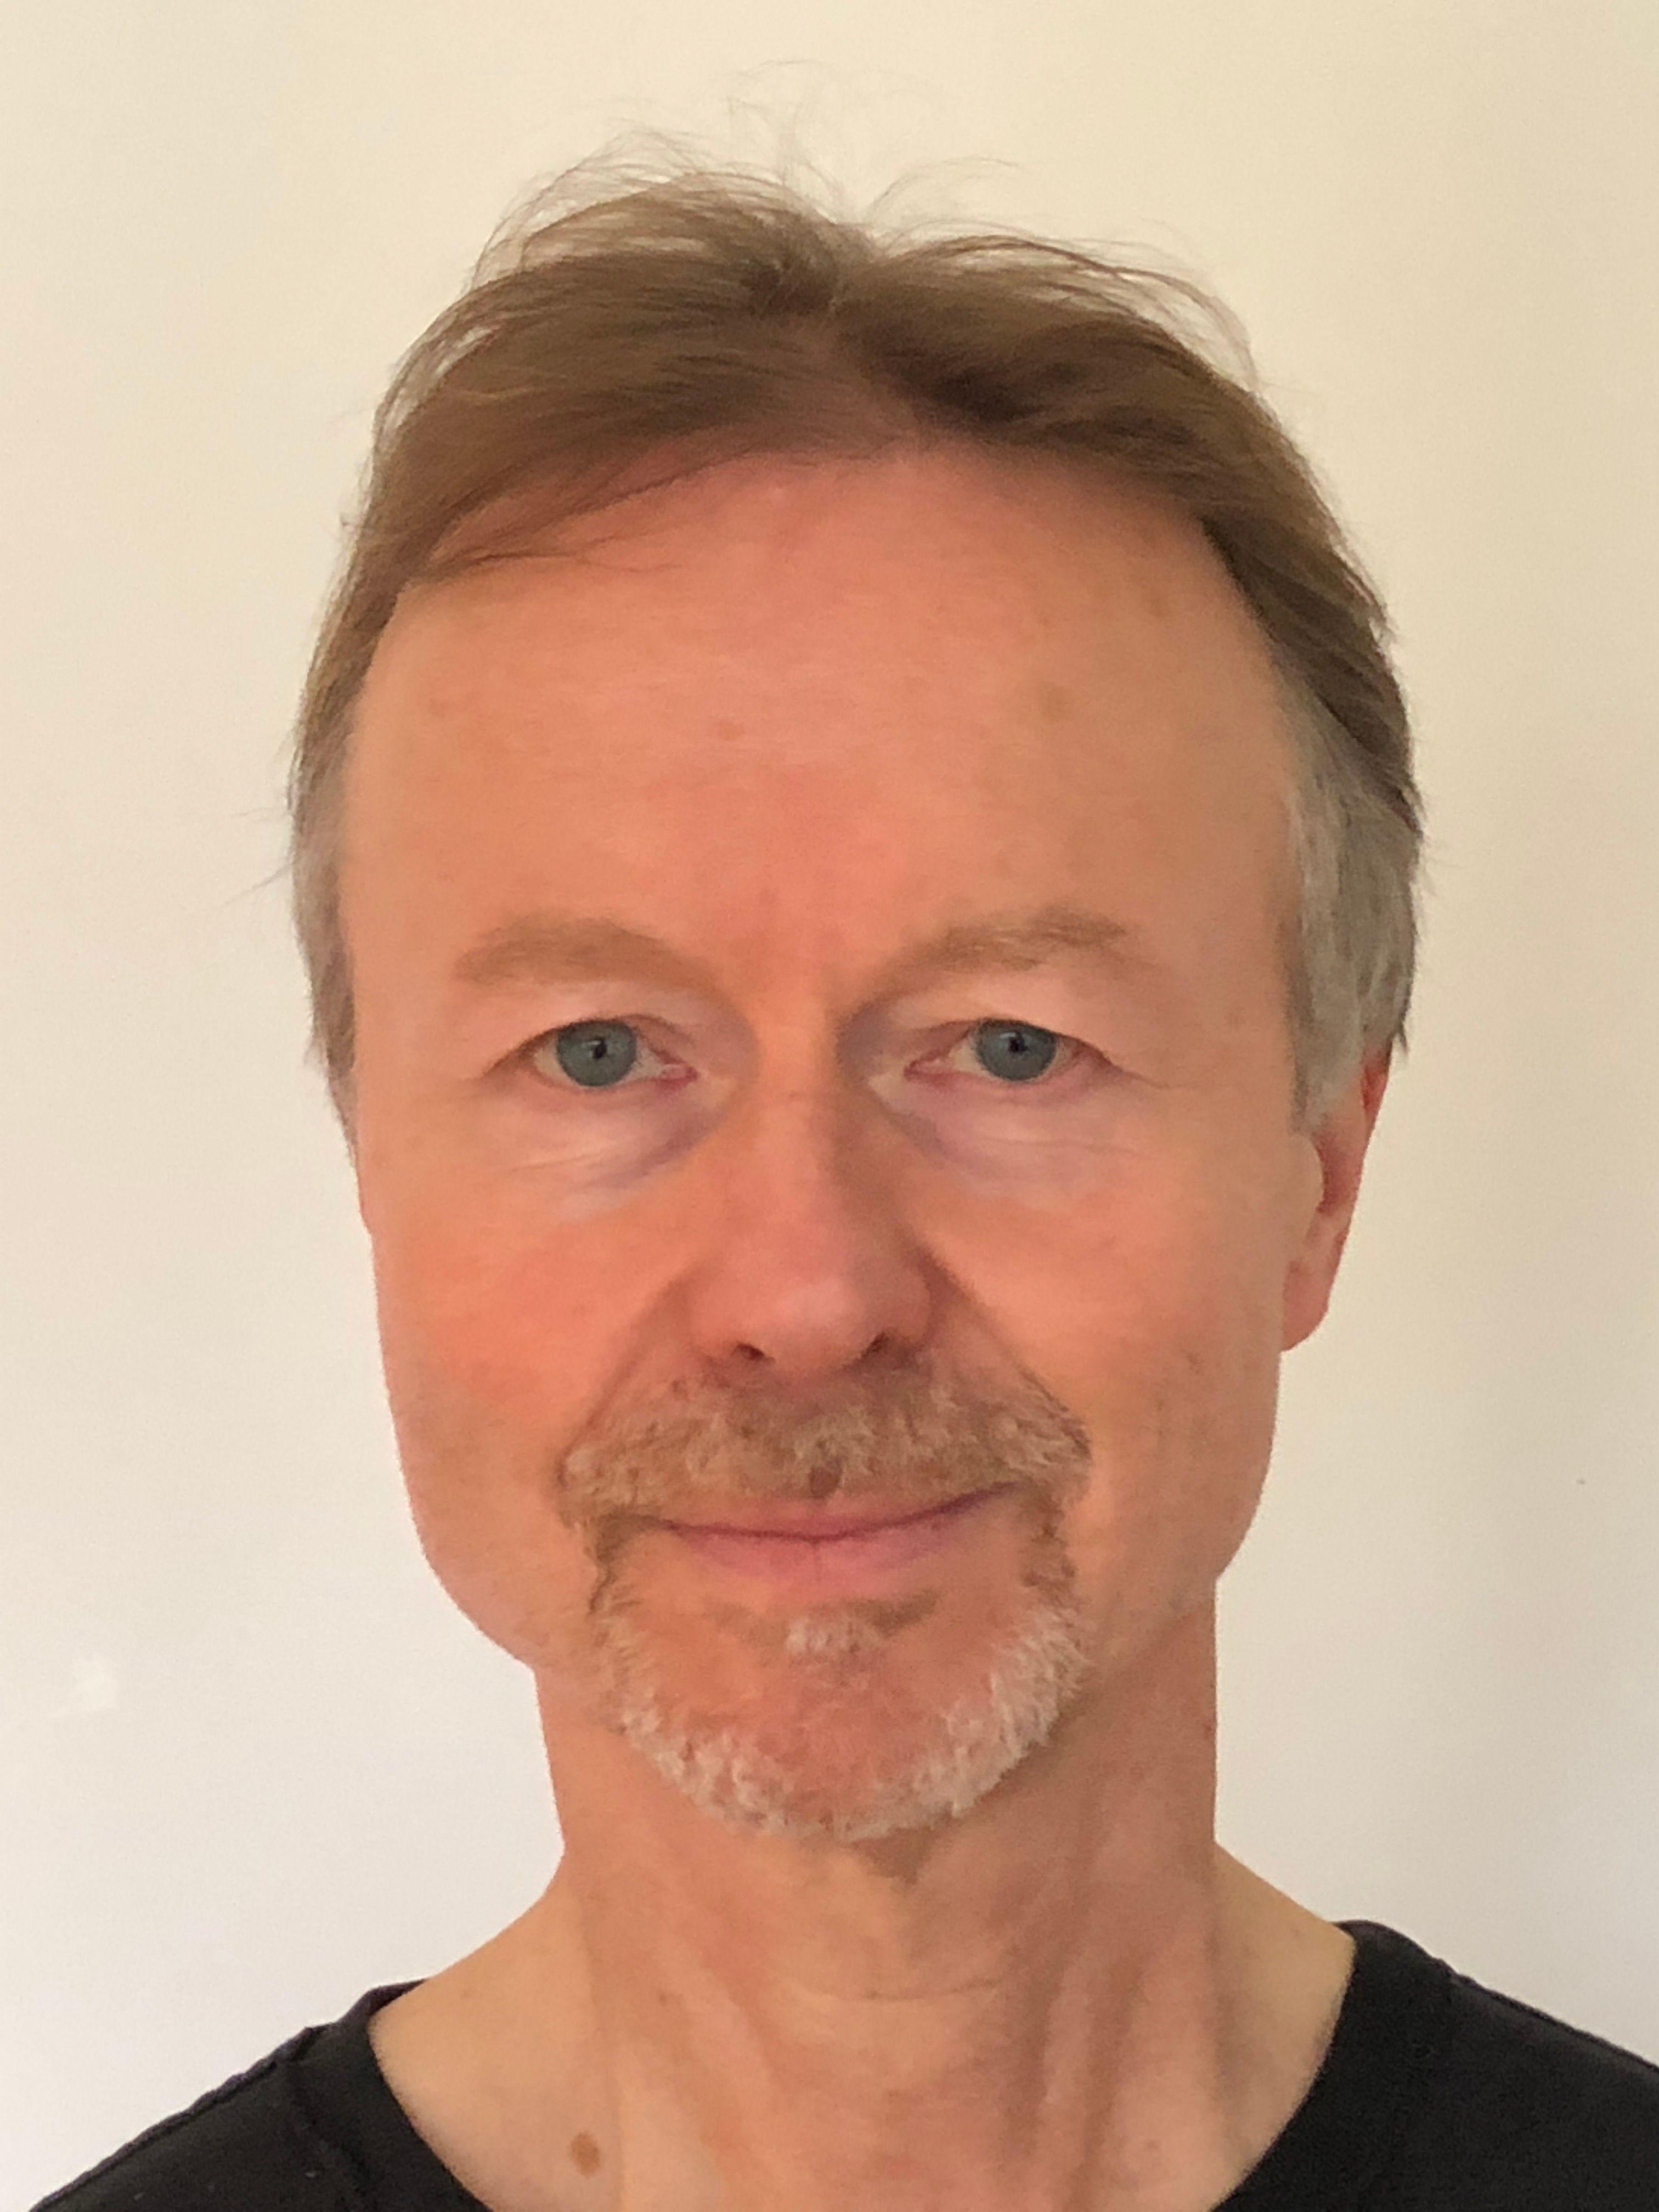 Watch Wolfram Tetzlaff on Locomotor Recovery after SCI (Working 2 Walk 2018)